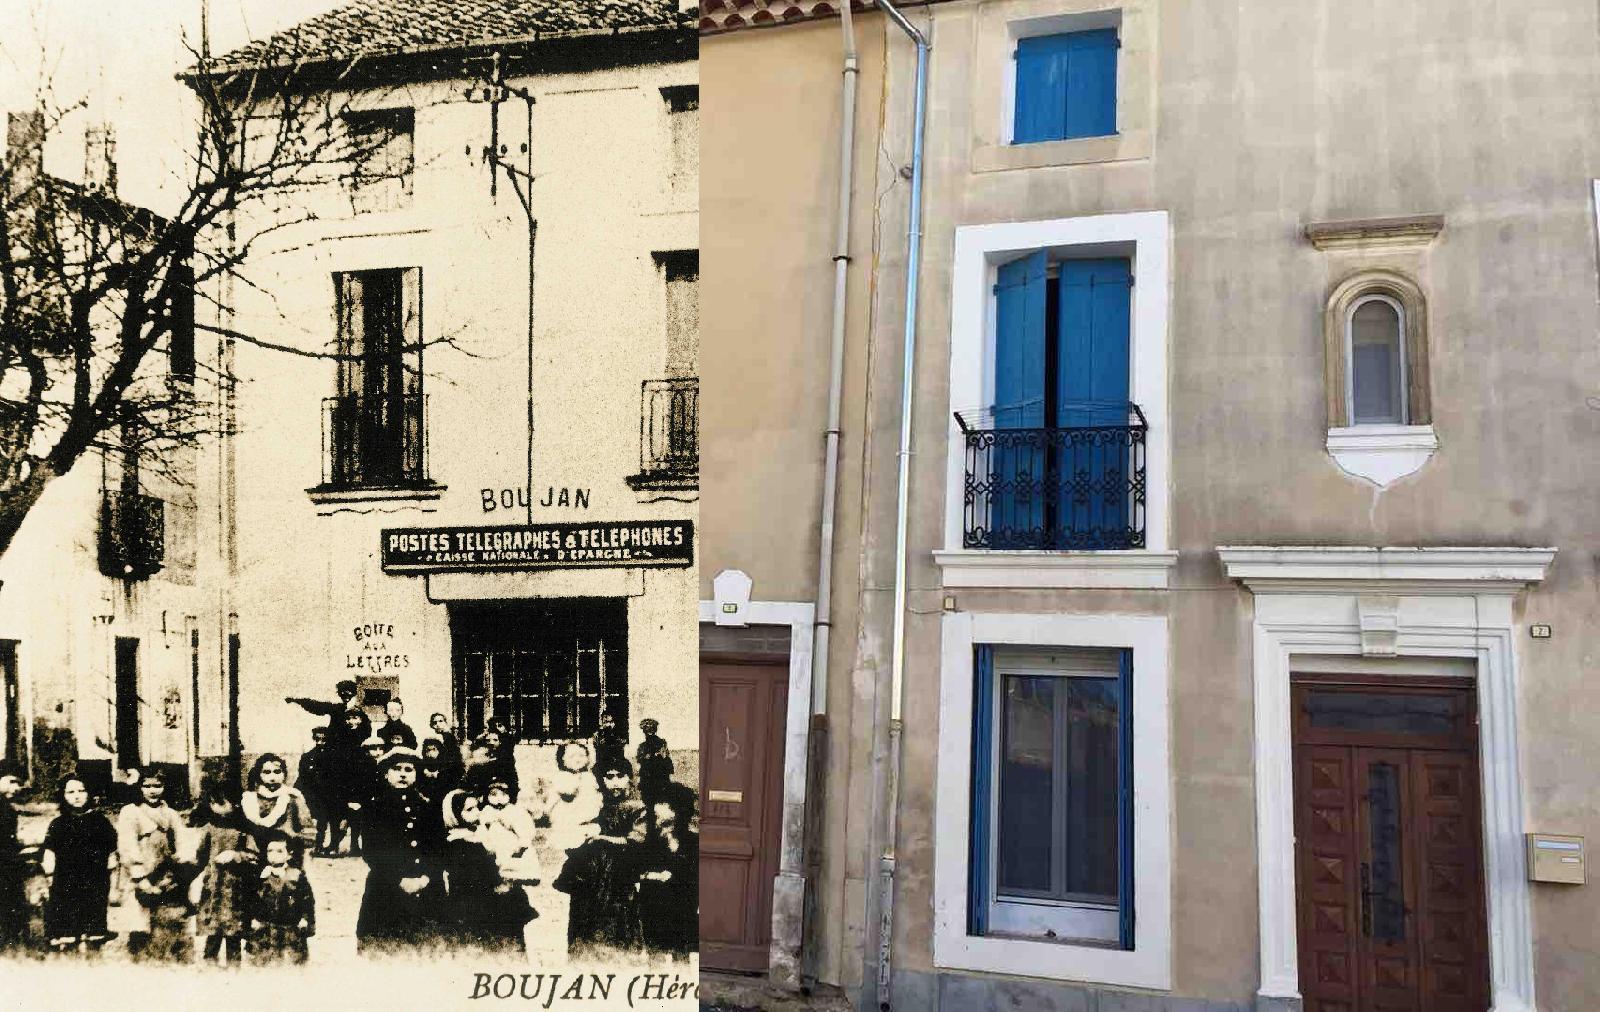 Boujan-sur-Libron - La Poste